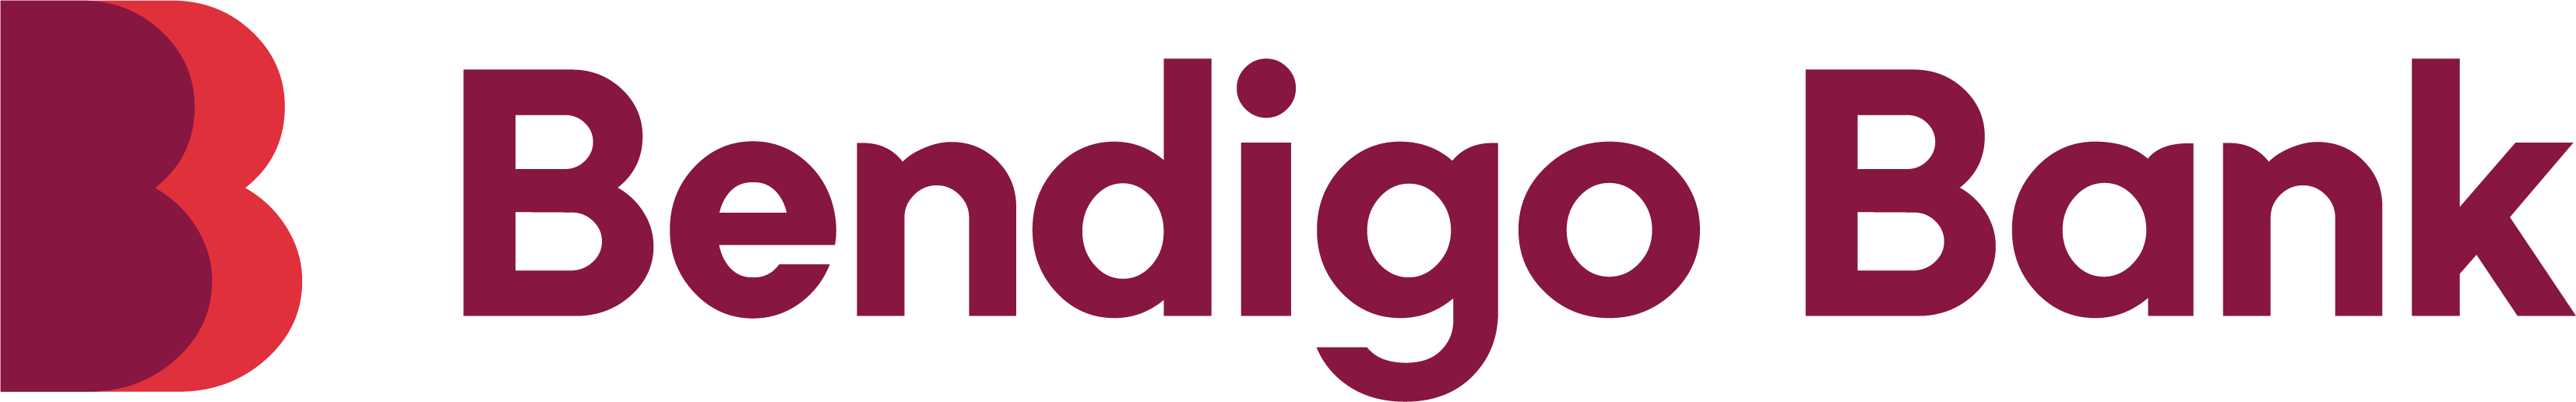 bb-bendigo-bank-logo-websafe